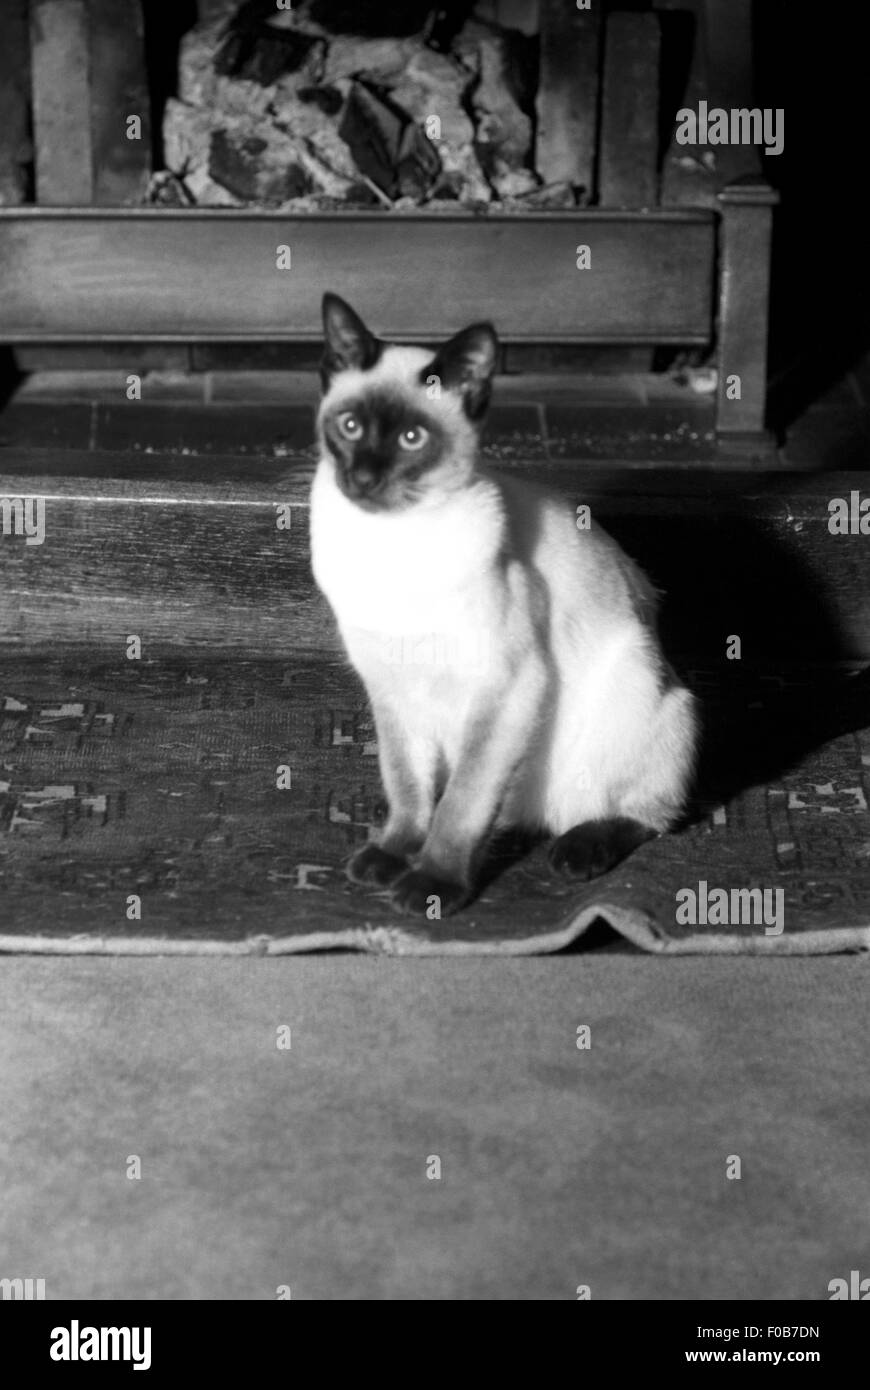 A Siamese pet cat - Stock Image